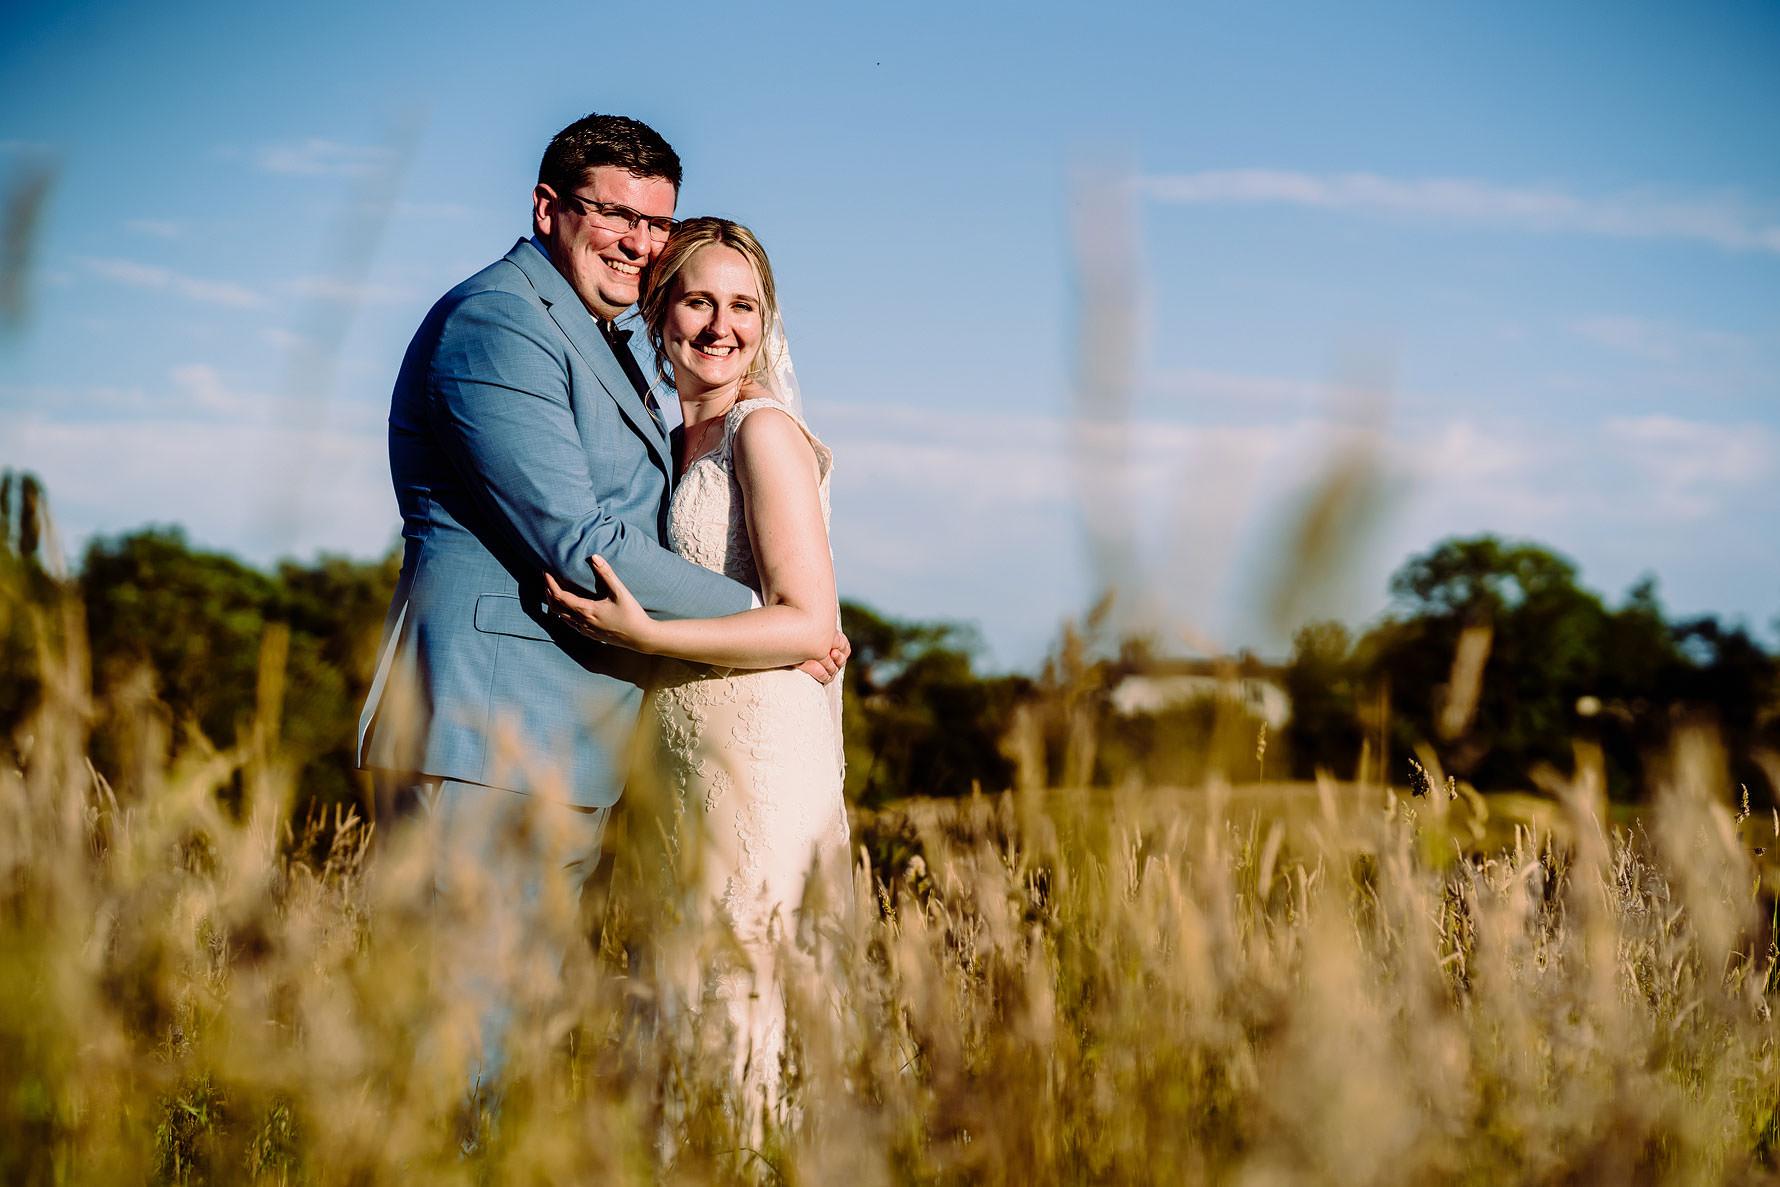 a wedding photo in a field